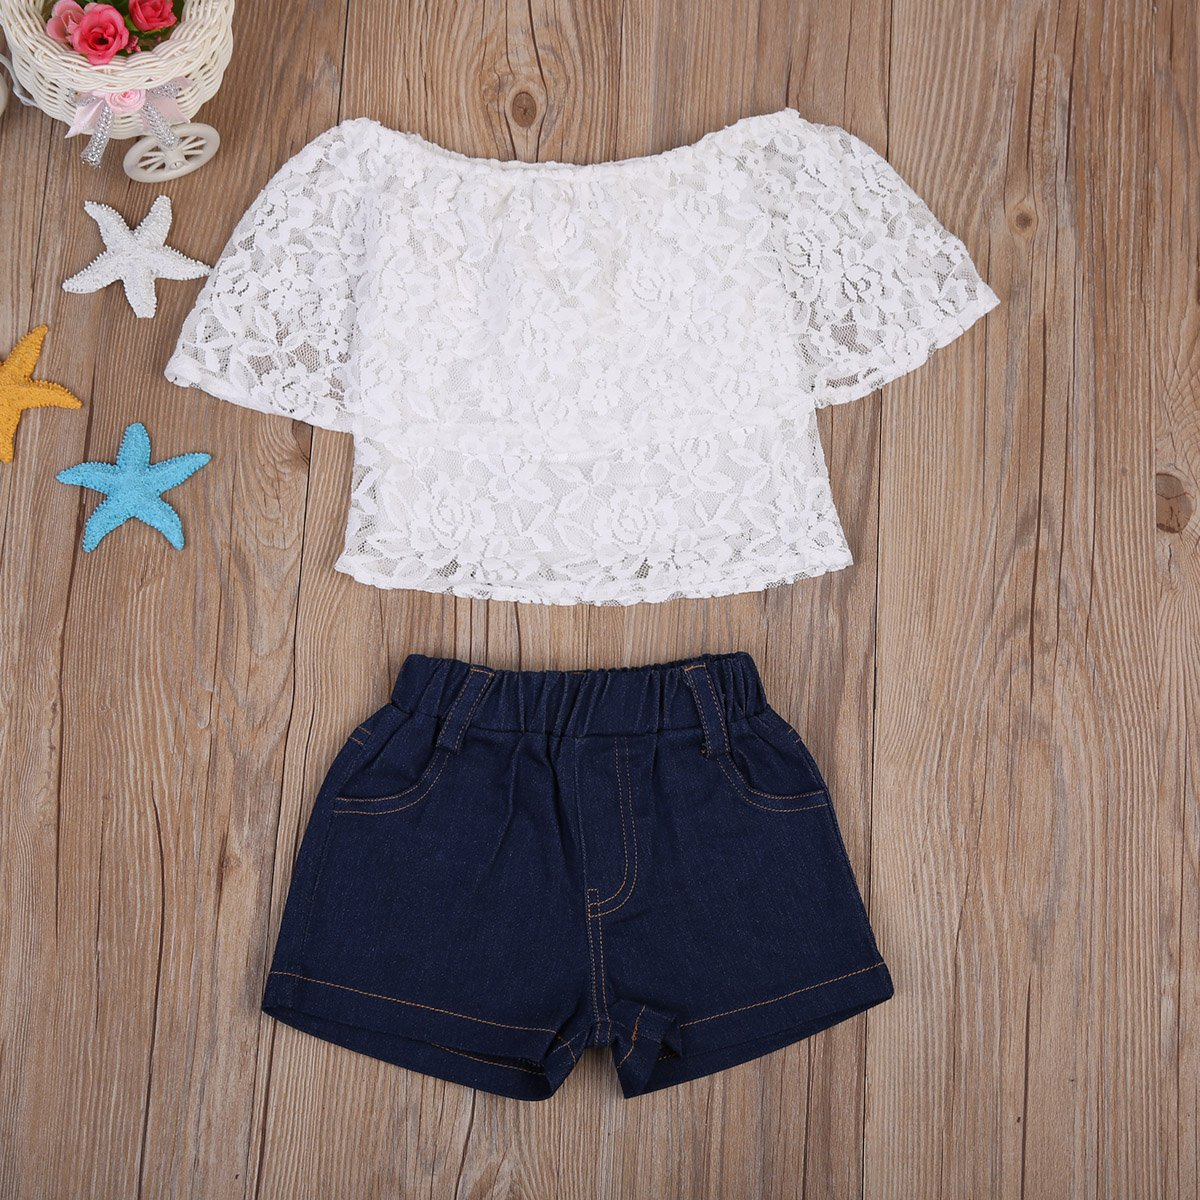 Combclub Toddler Baby Girls Off Shoulder Lace Tops+Short Denim Pants Summer Outfits Short Sets